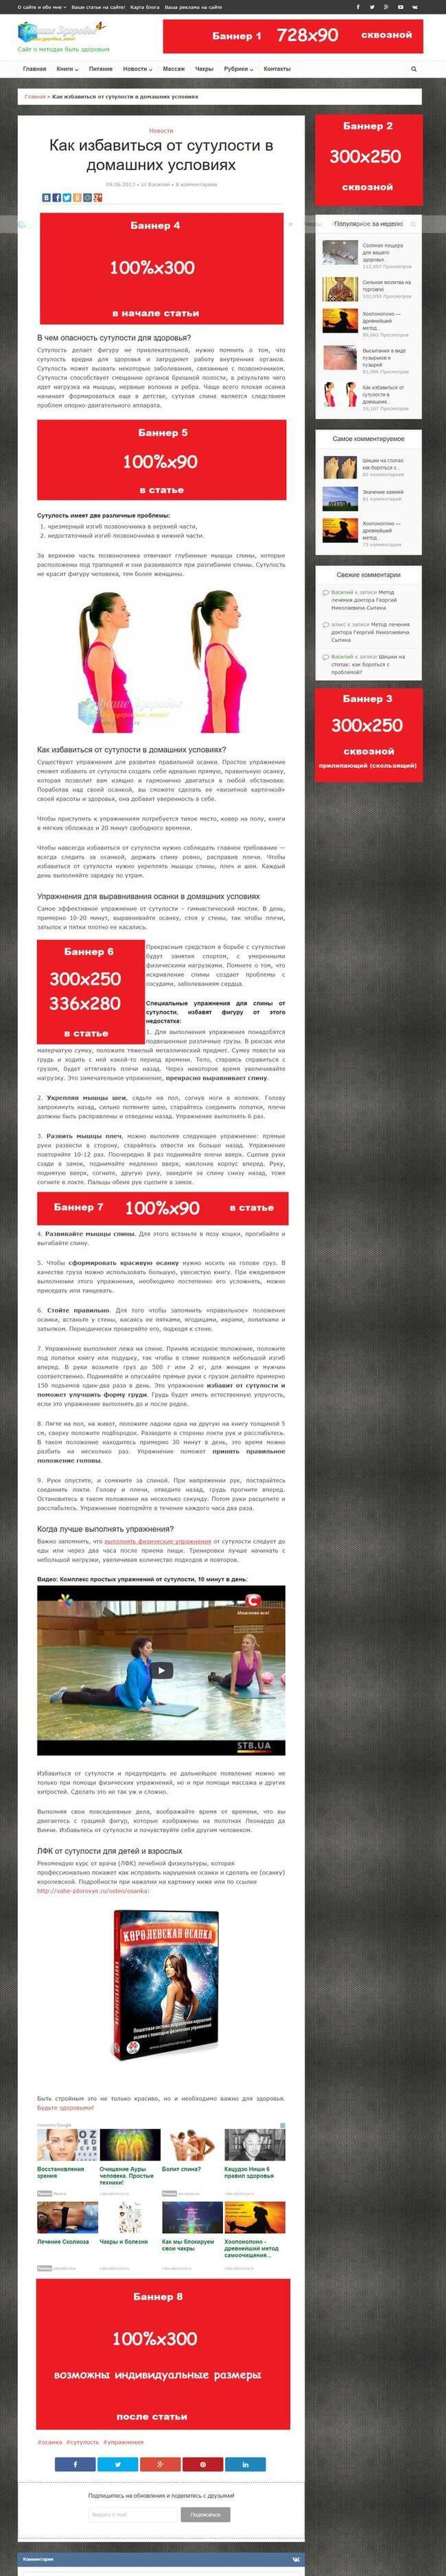 Размещение баннера на сайте vahe-zdorovye.ru